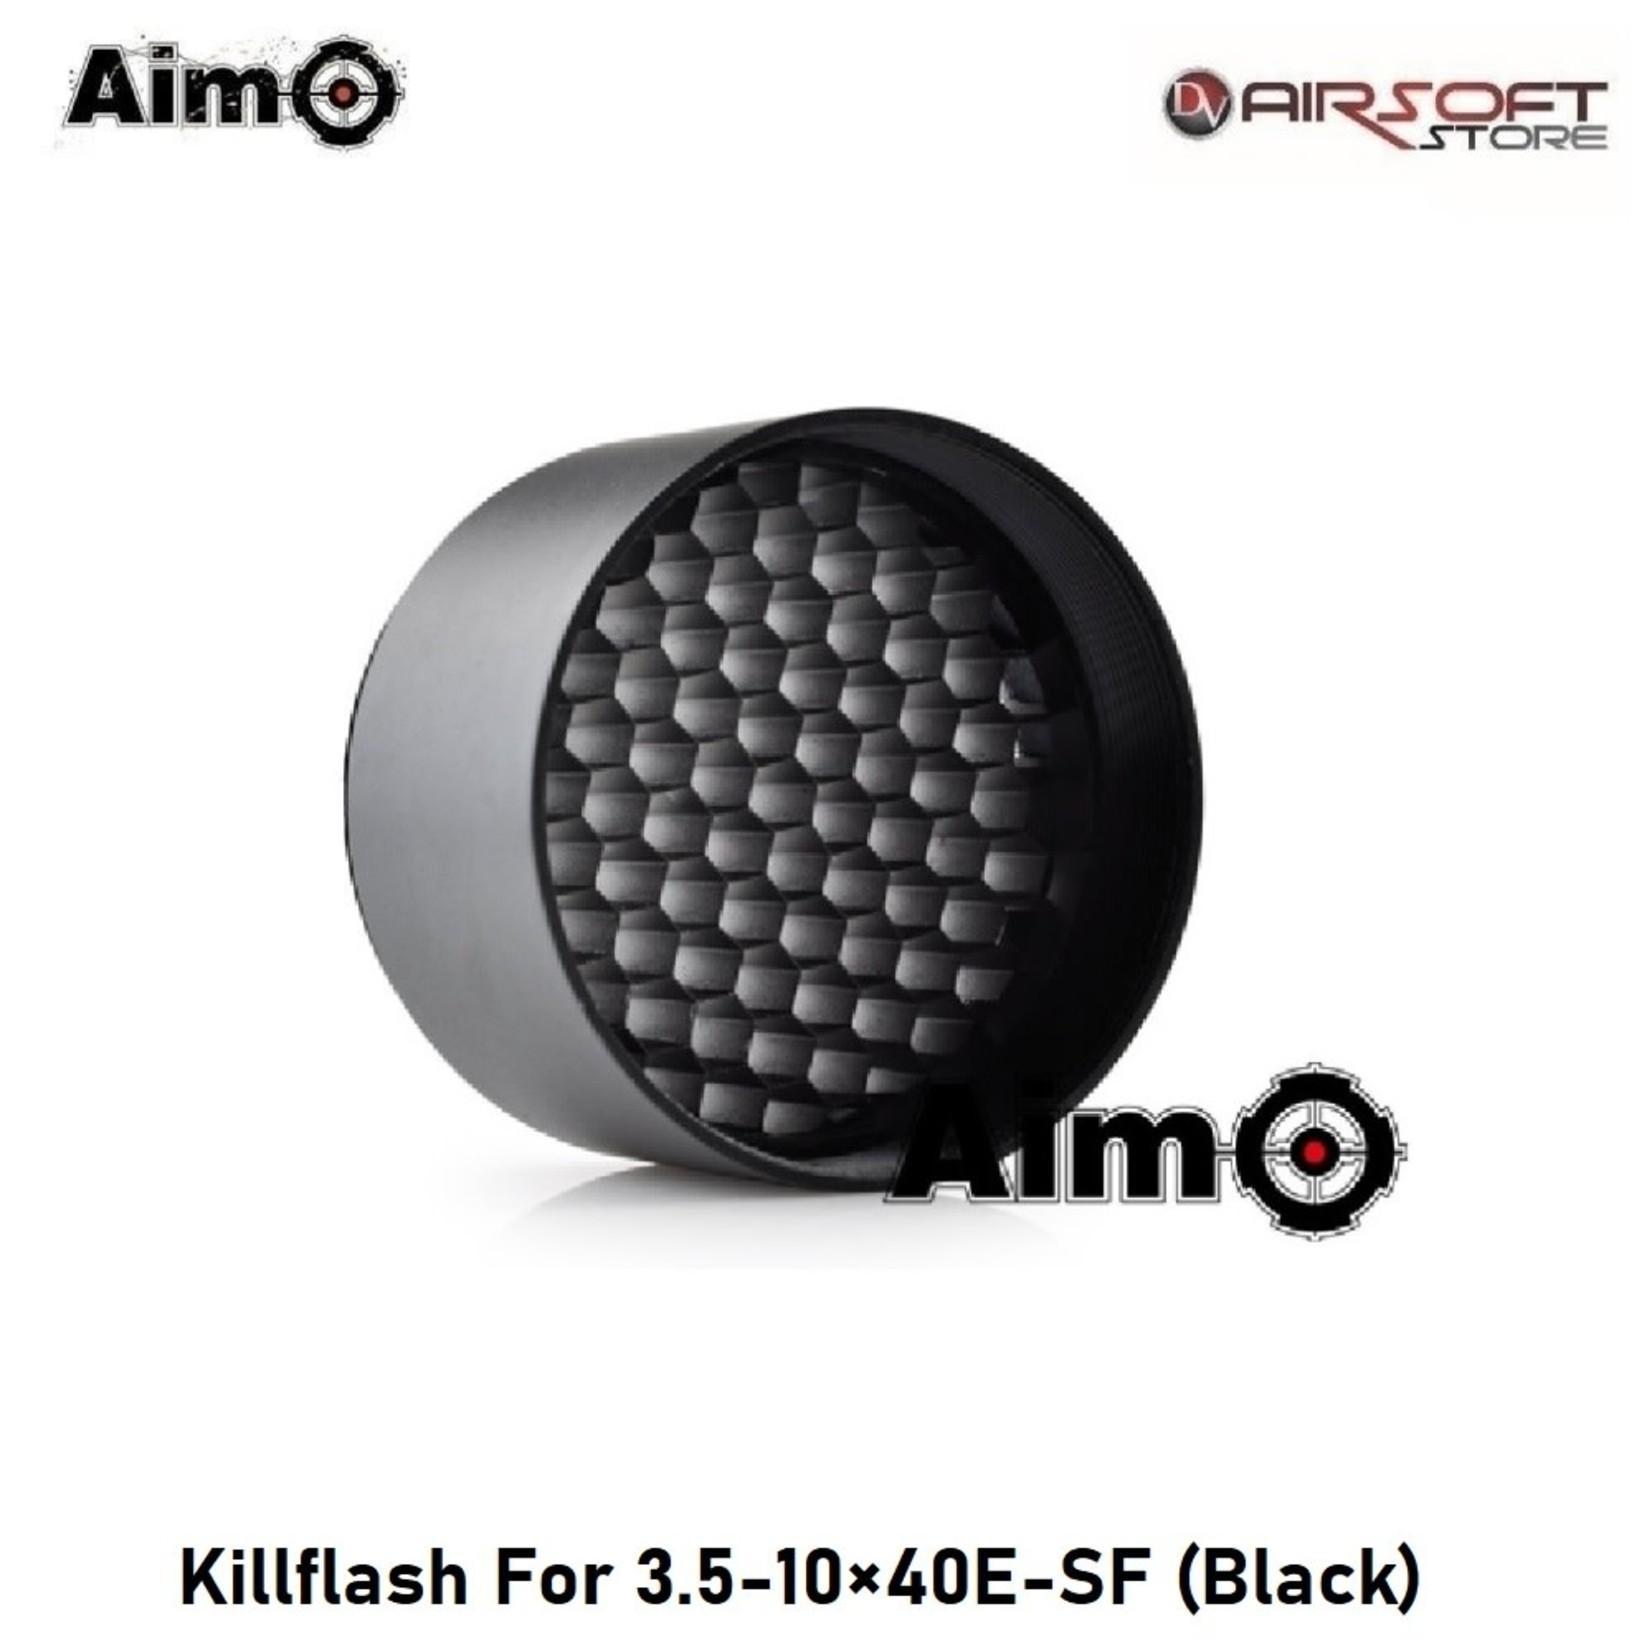 Aim-O Killflash For 3.5-10×40E-SF (Black)